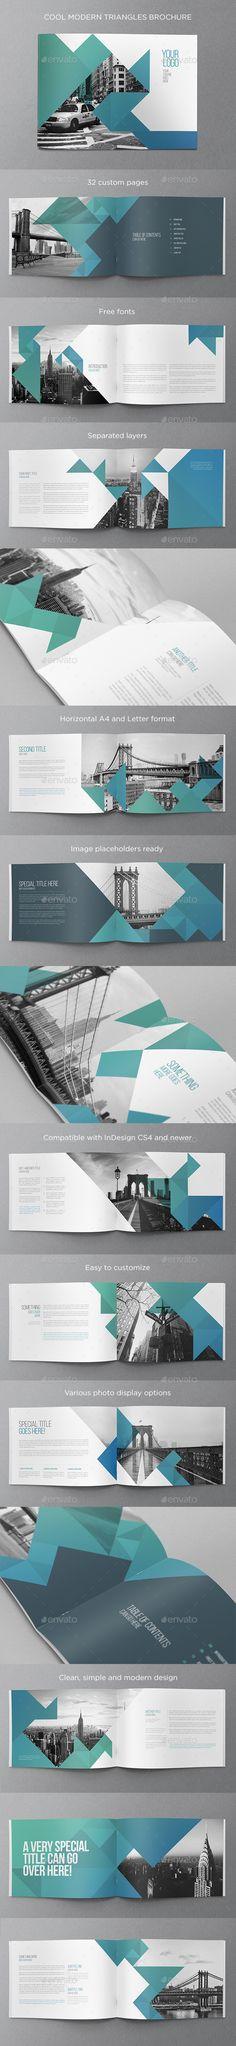 Cool Modern Brochure 1183 best Brochures images